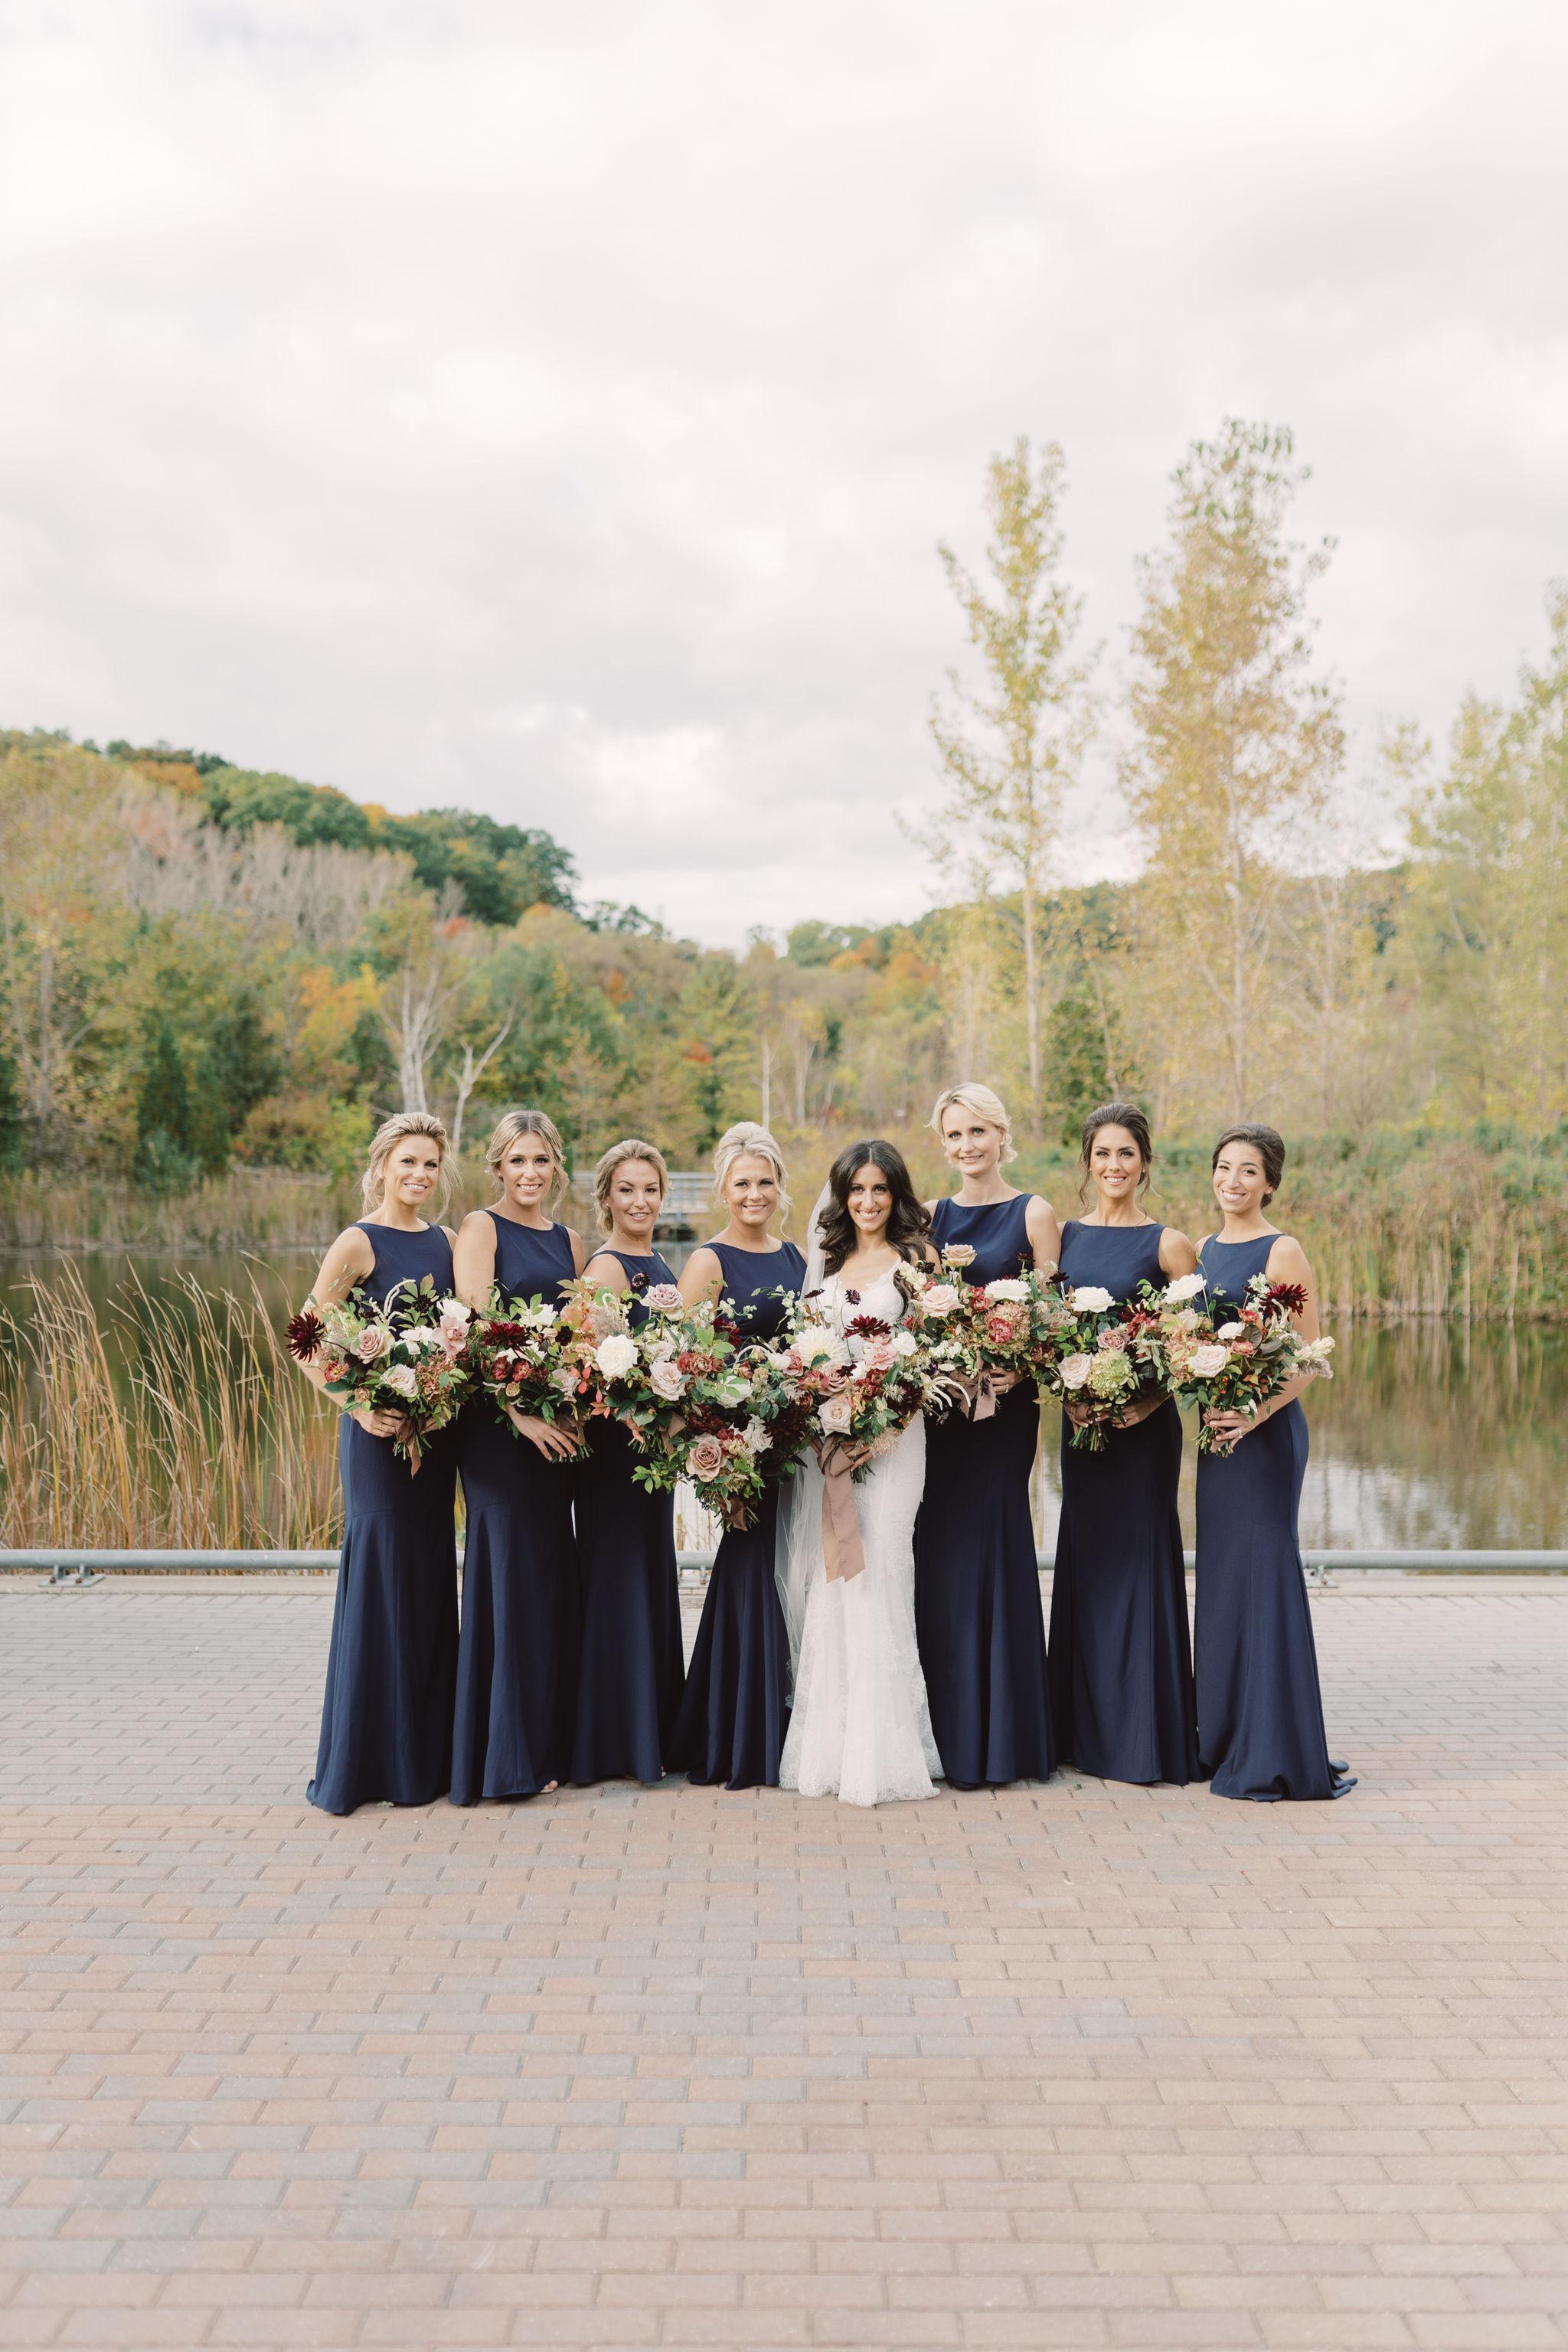 0724-artiese-evergreen-brickworks-wedding-ashleycraig-03347.jpg